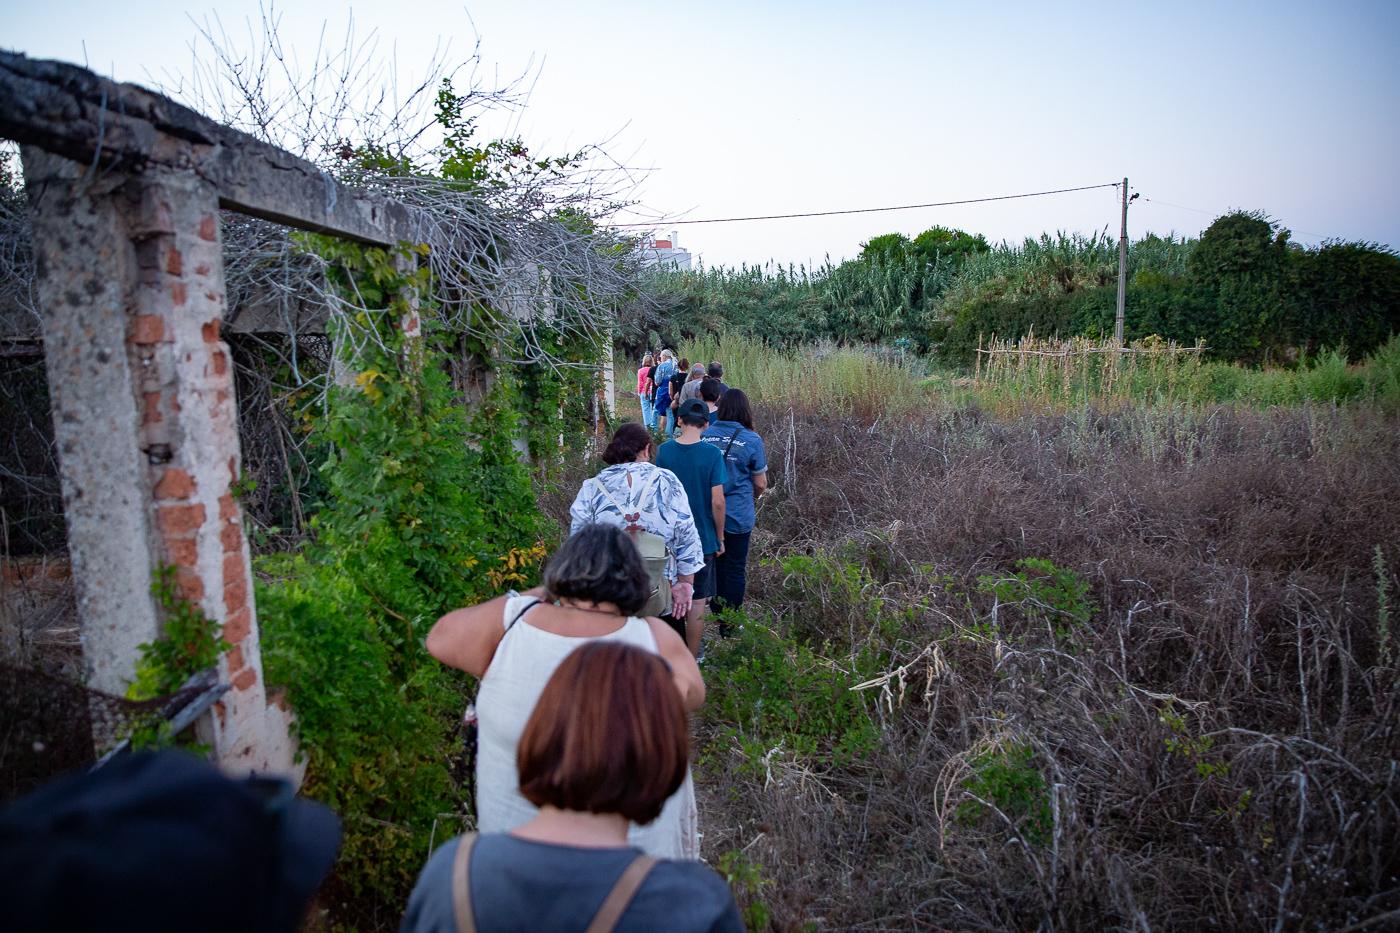 ohtli en MAR 2018 (Sines, Portugal) - Foto de Alípio Padilha4.jpg